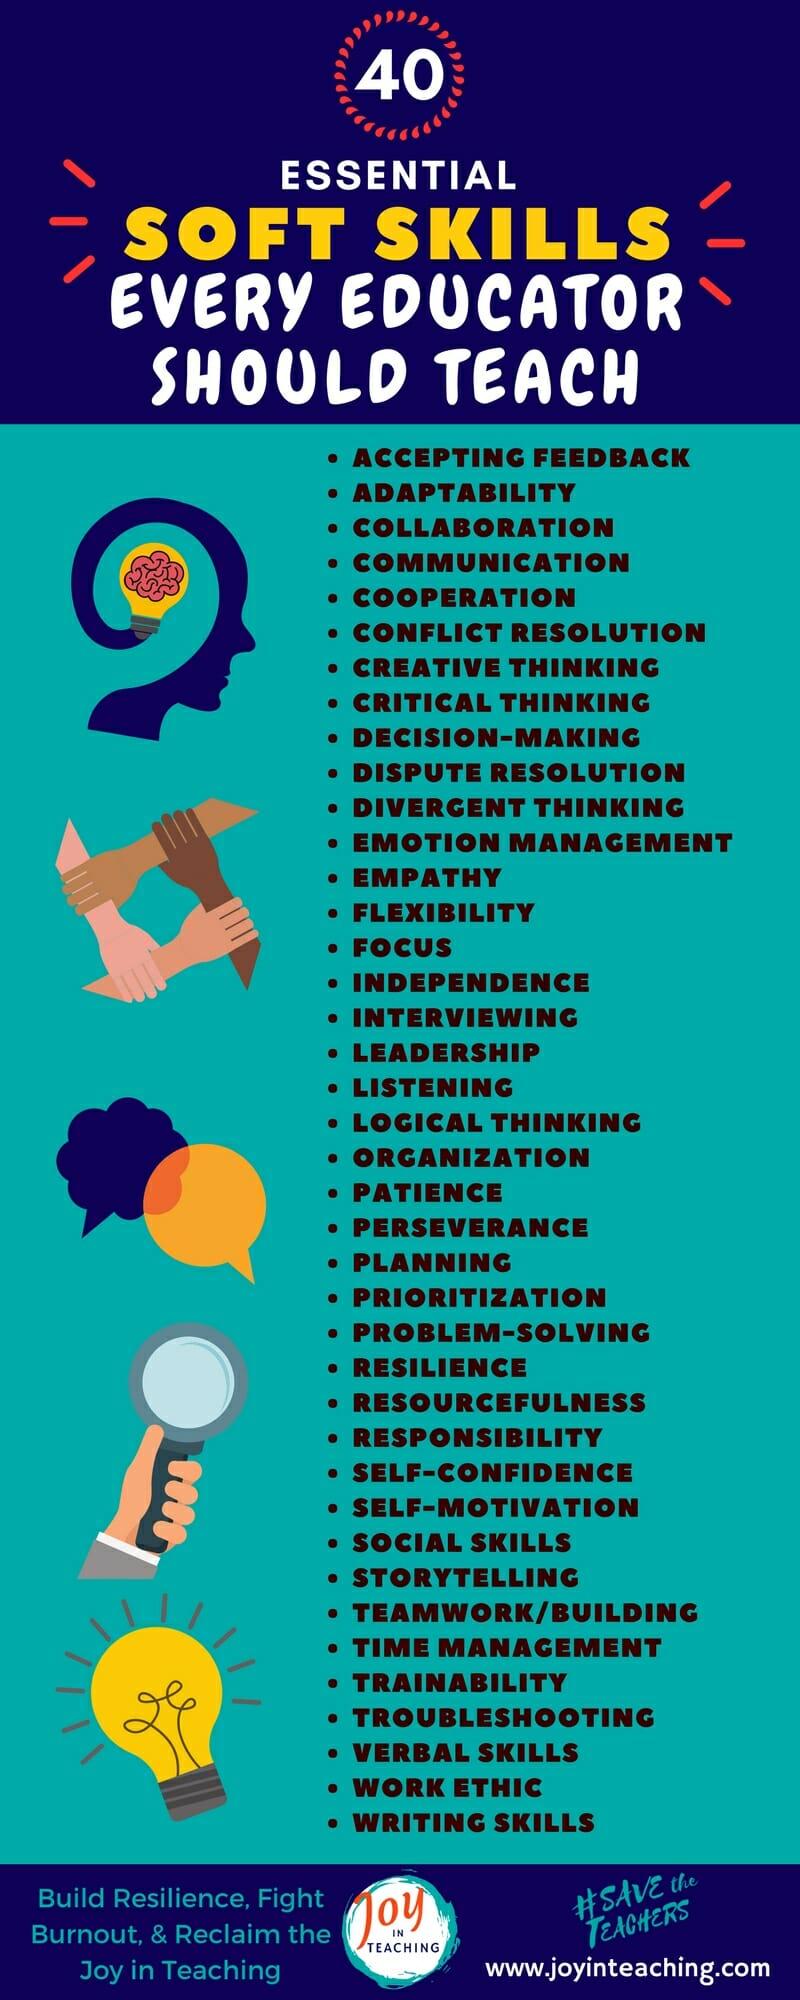 40 Essential SOFT SKILLS Every Educator Should Teach